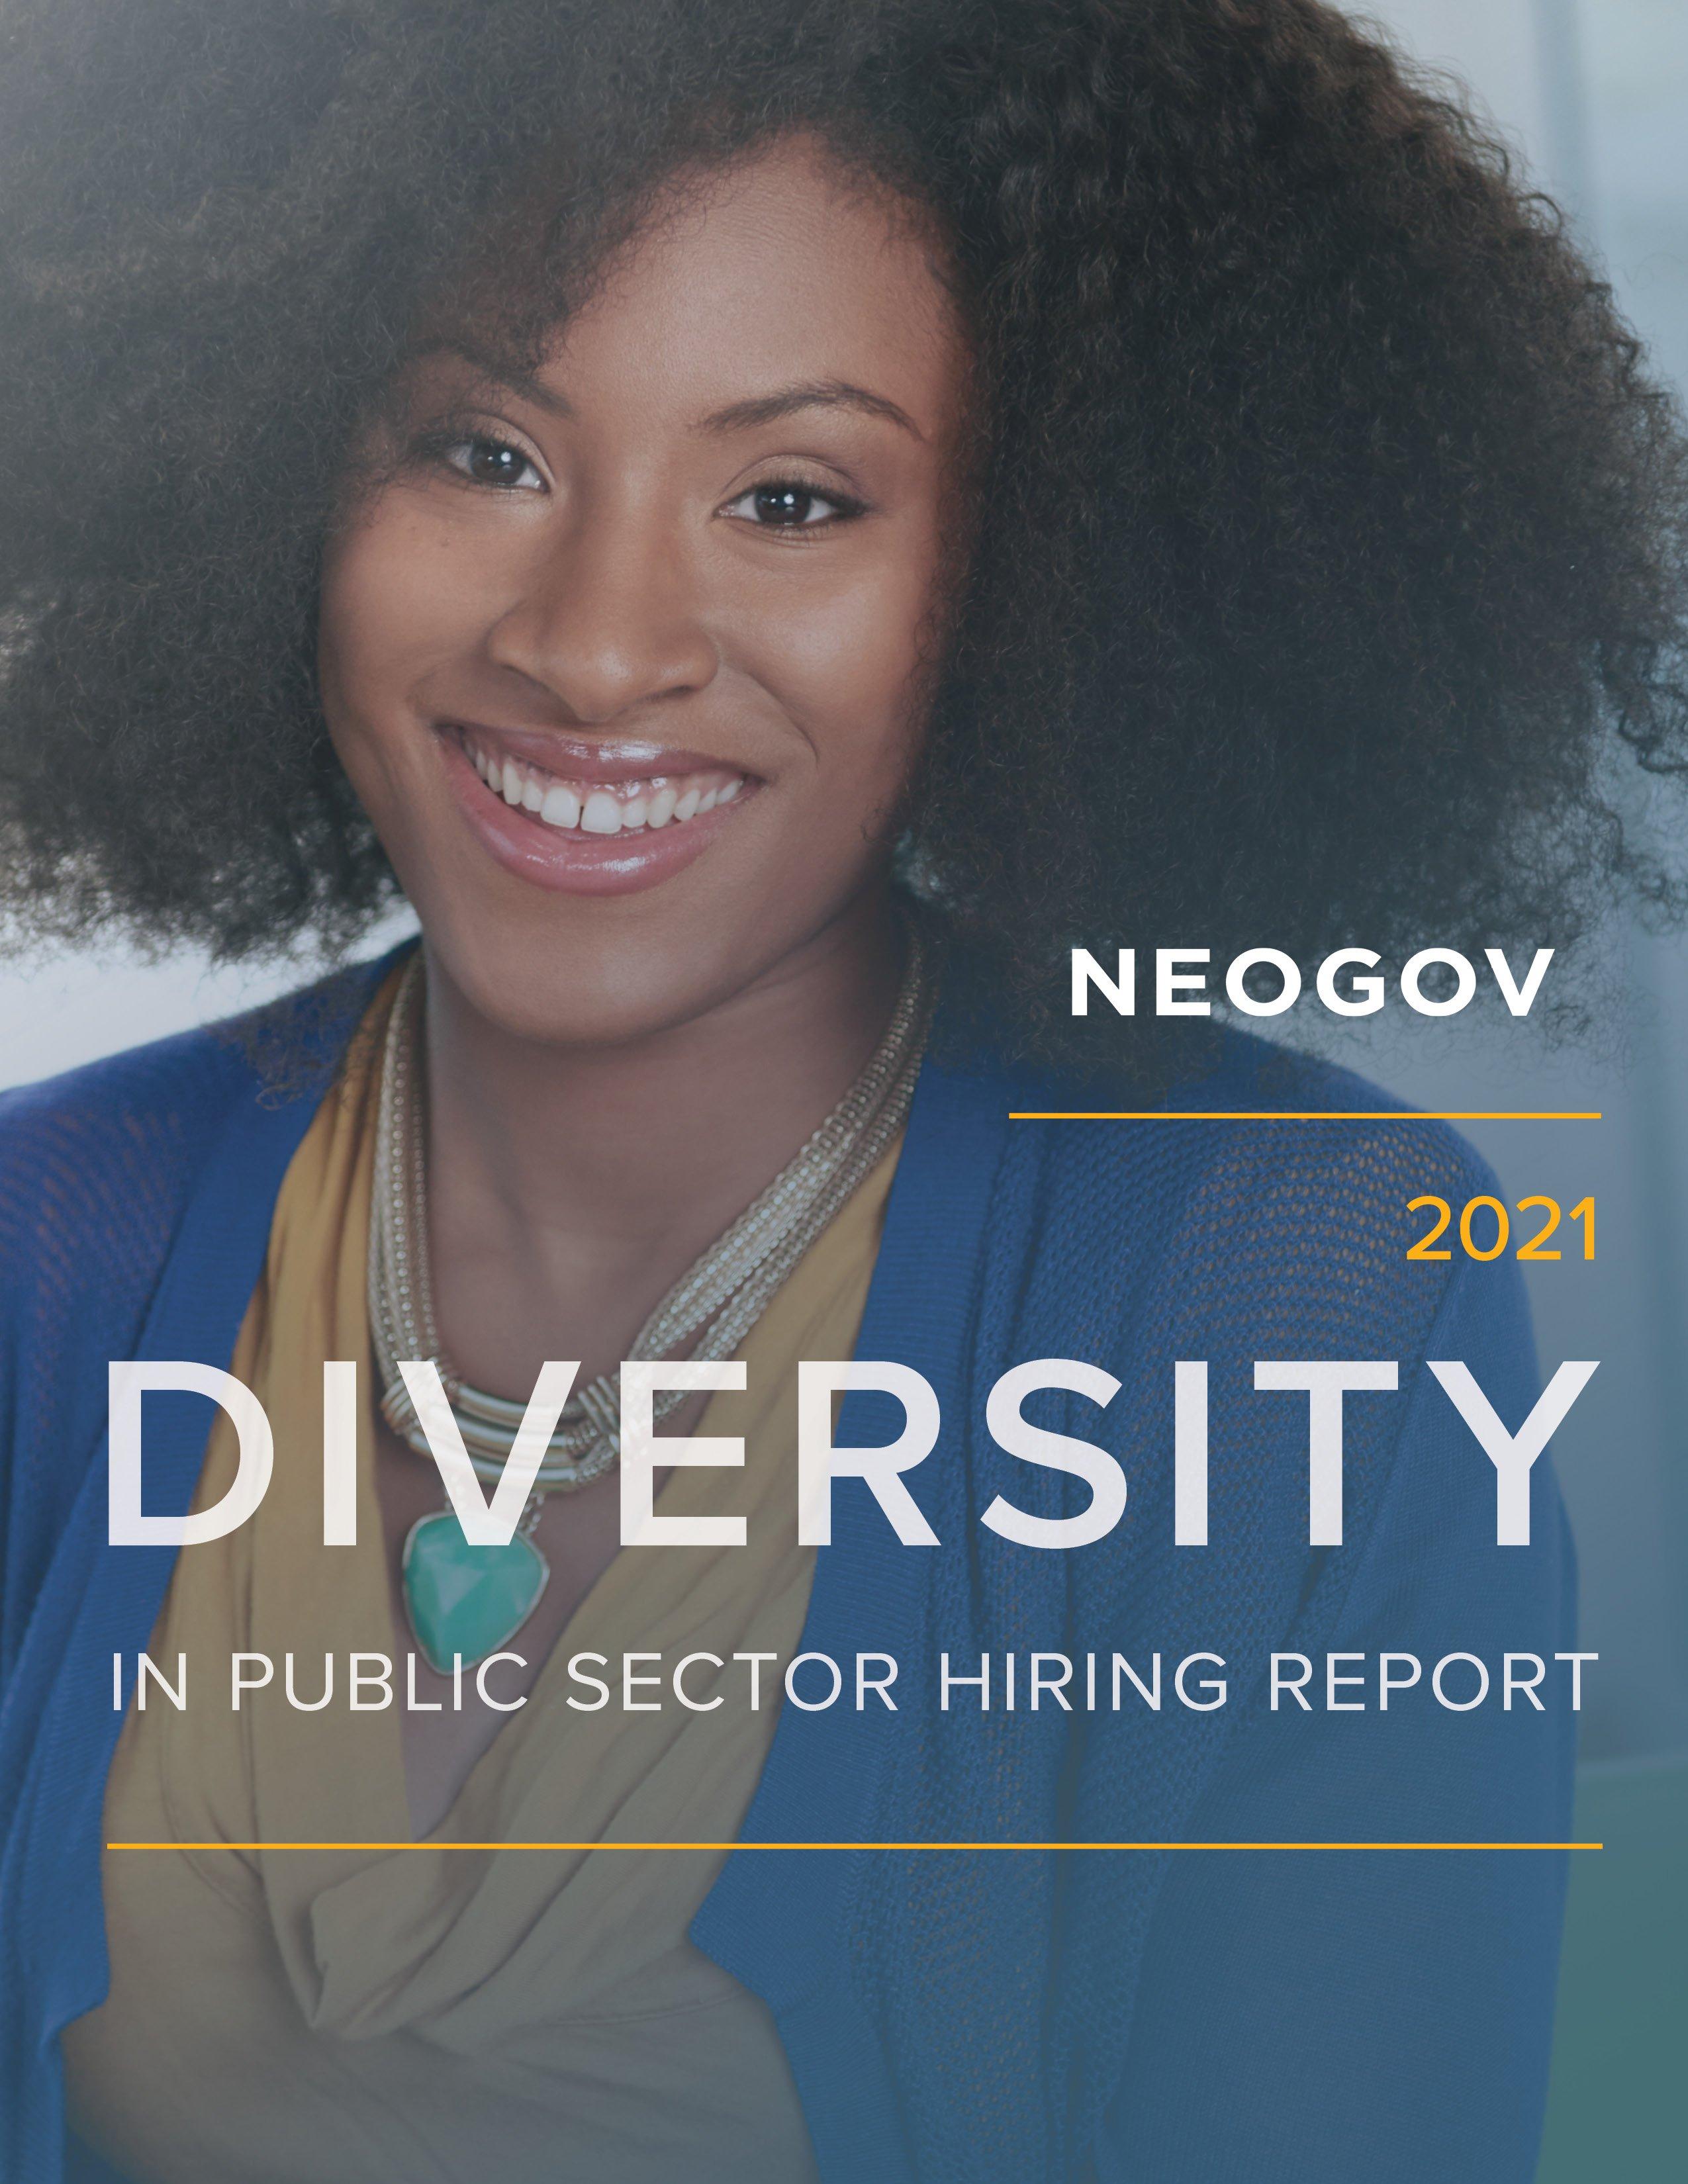 NEOGOV 2021 Diversity Report